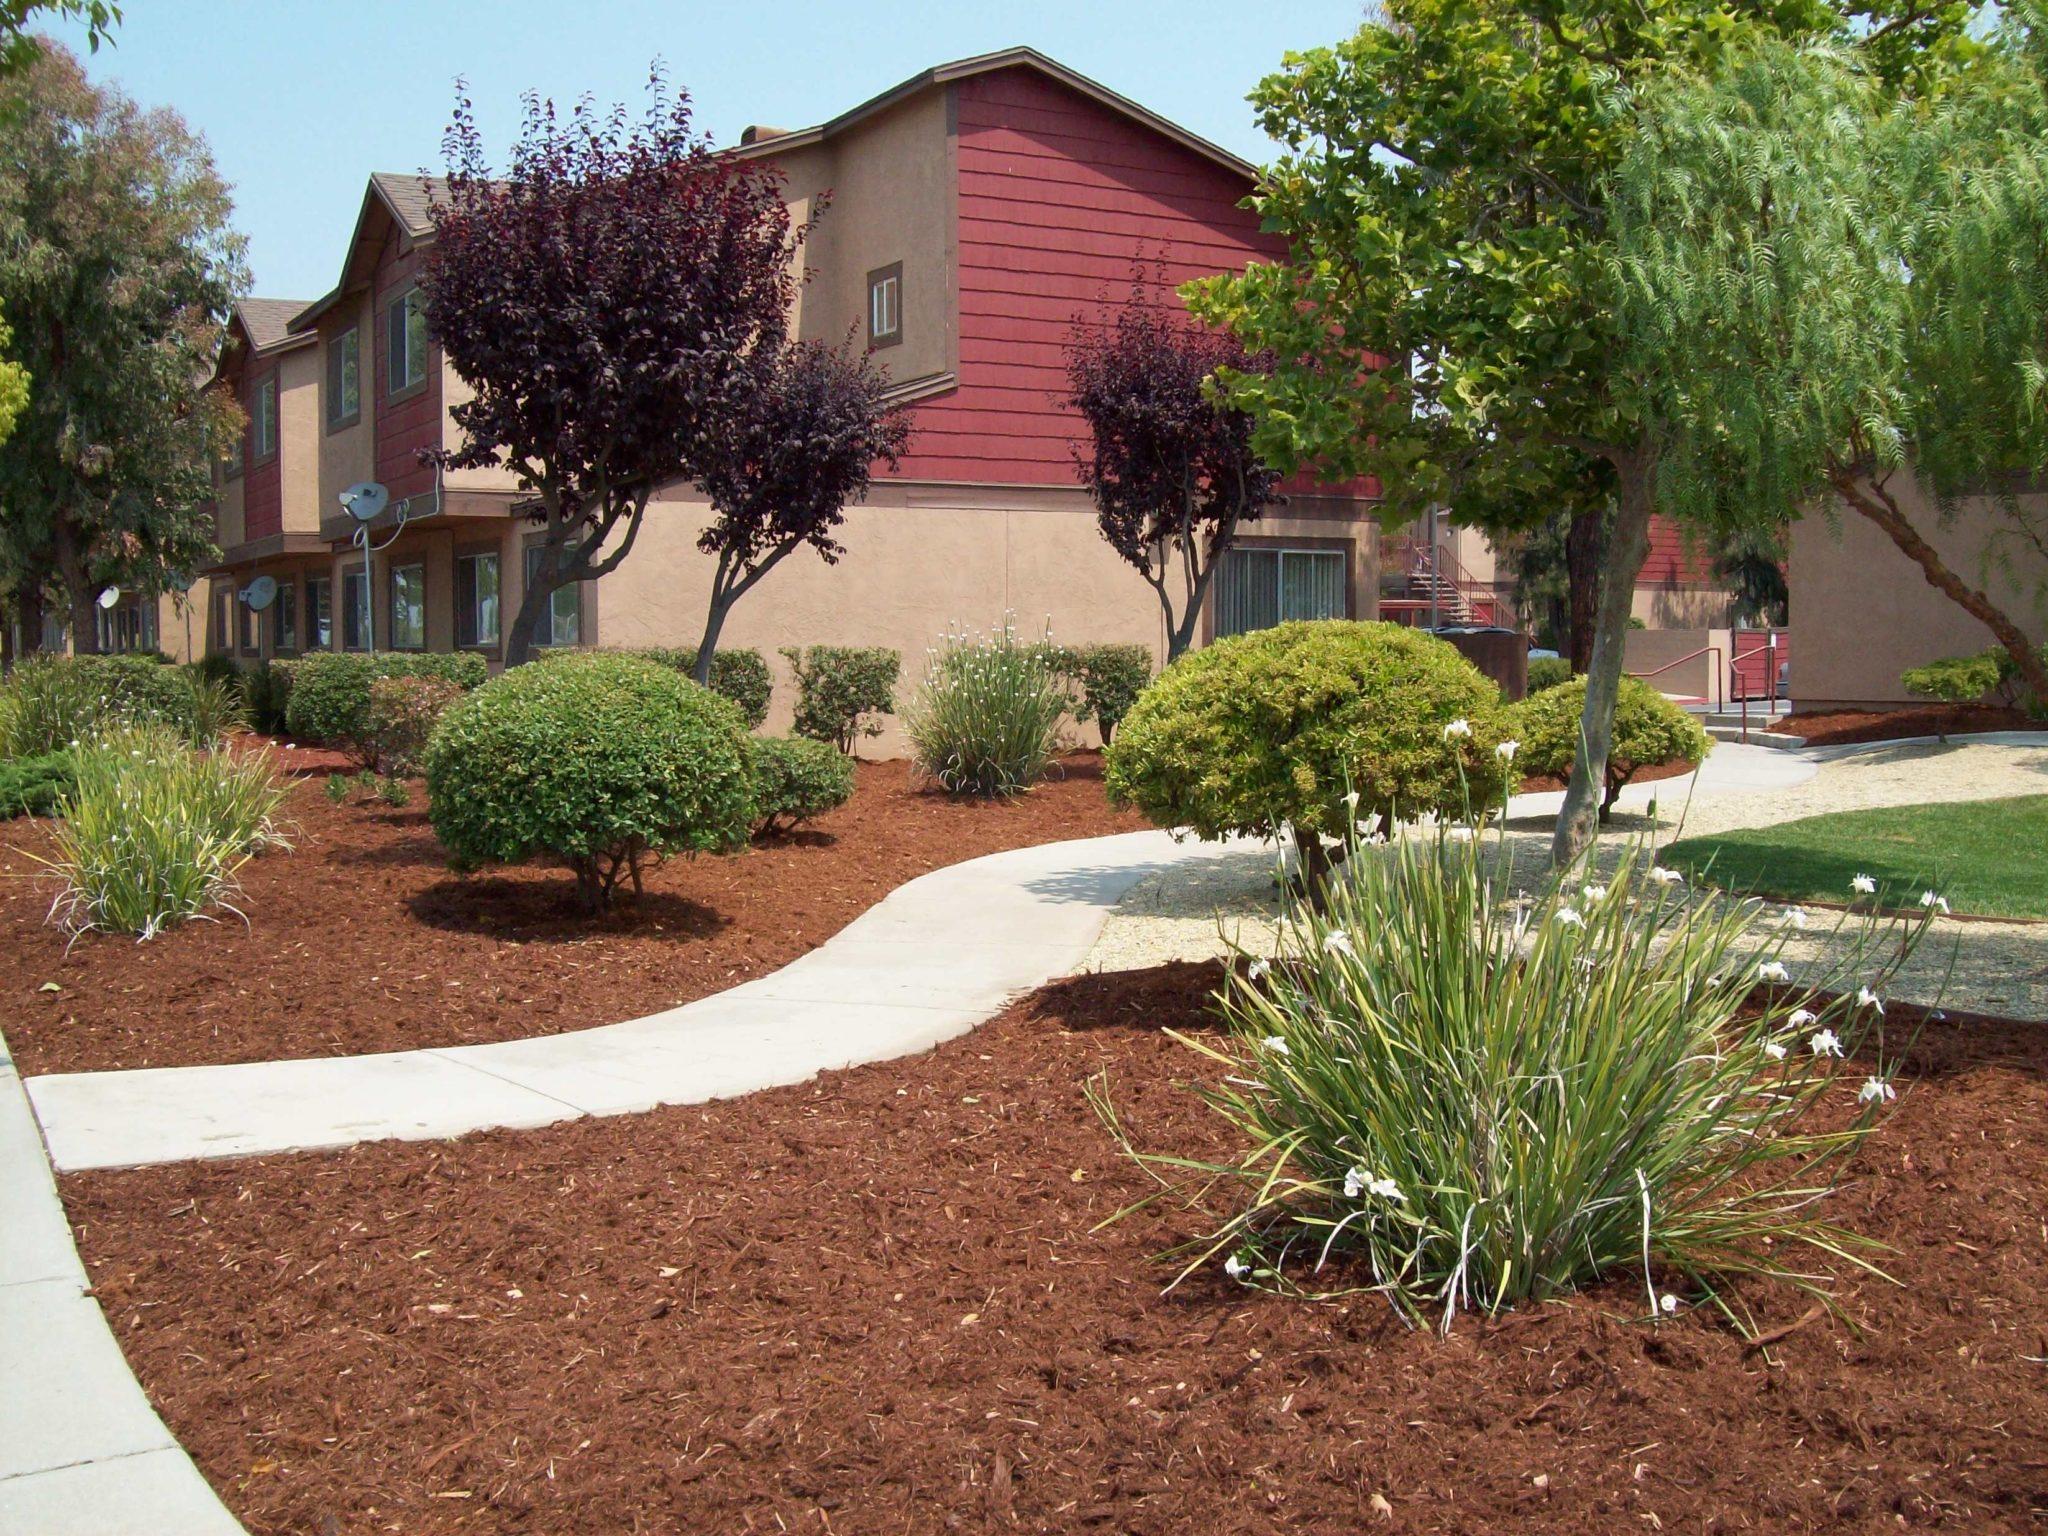 Chispa | Jardines de Soledad